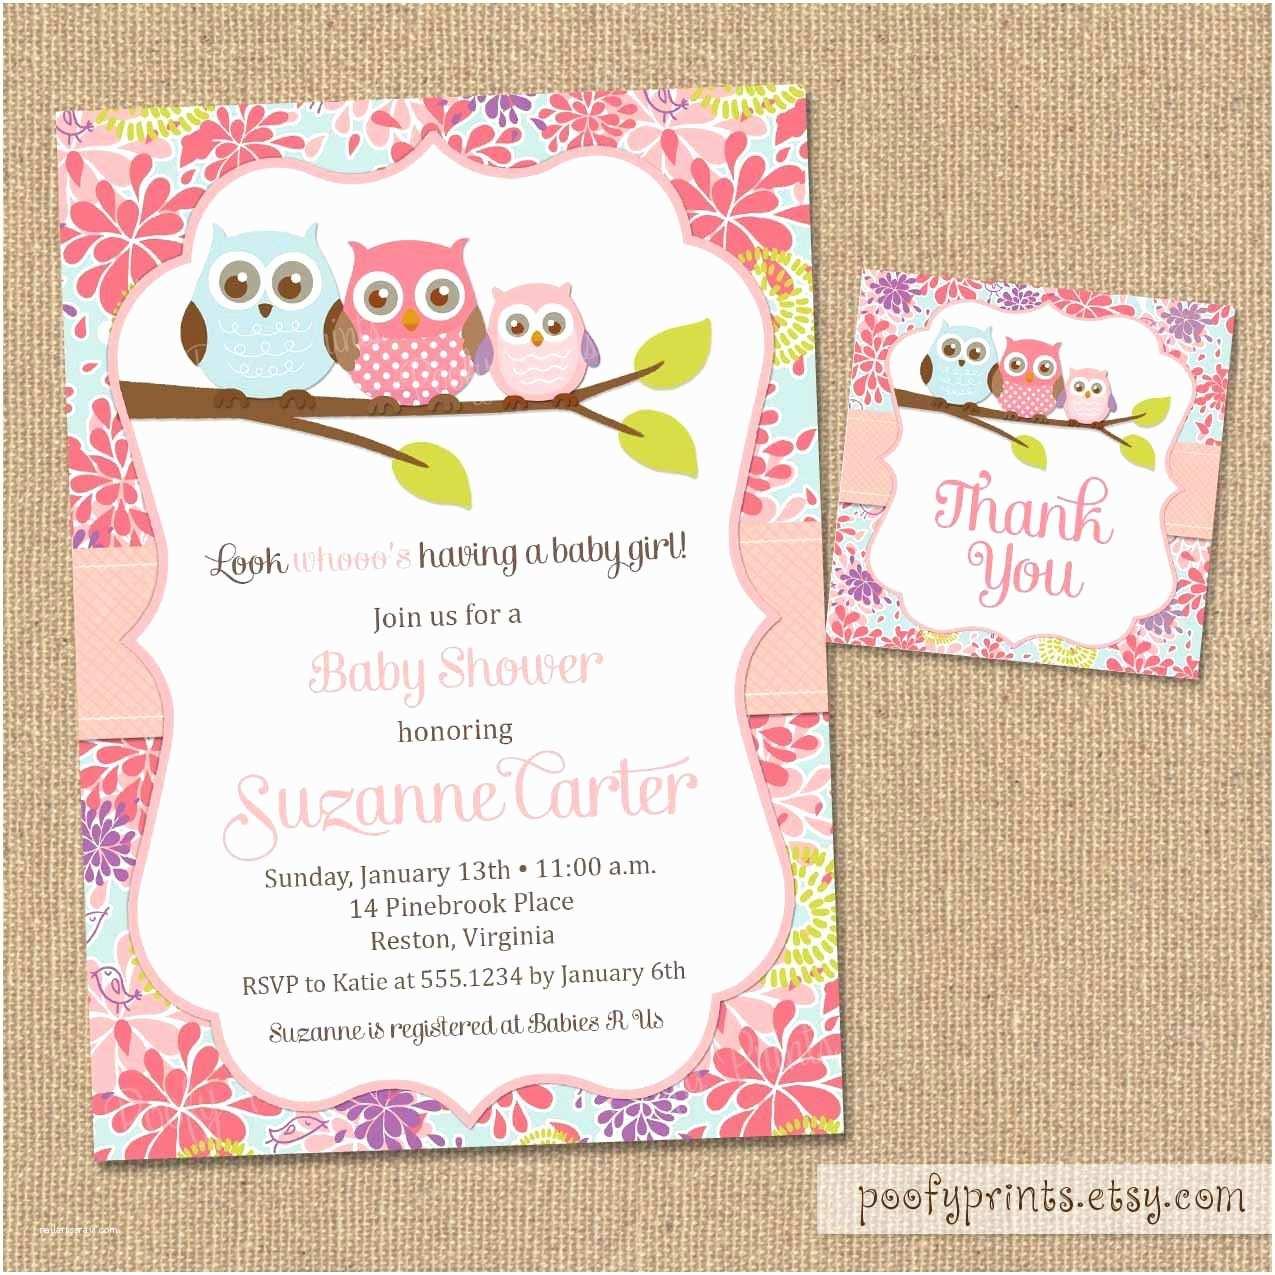 Baby Shower Invitations Free Owl Baby Shower Invitations Diy Printable Baby Girl